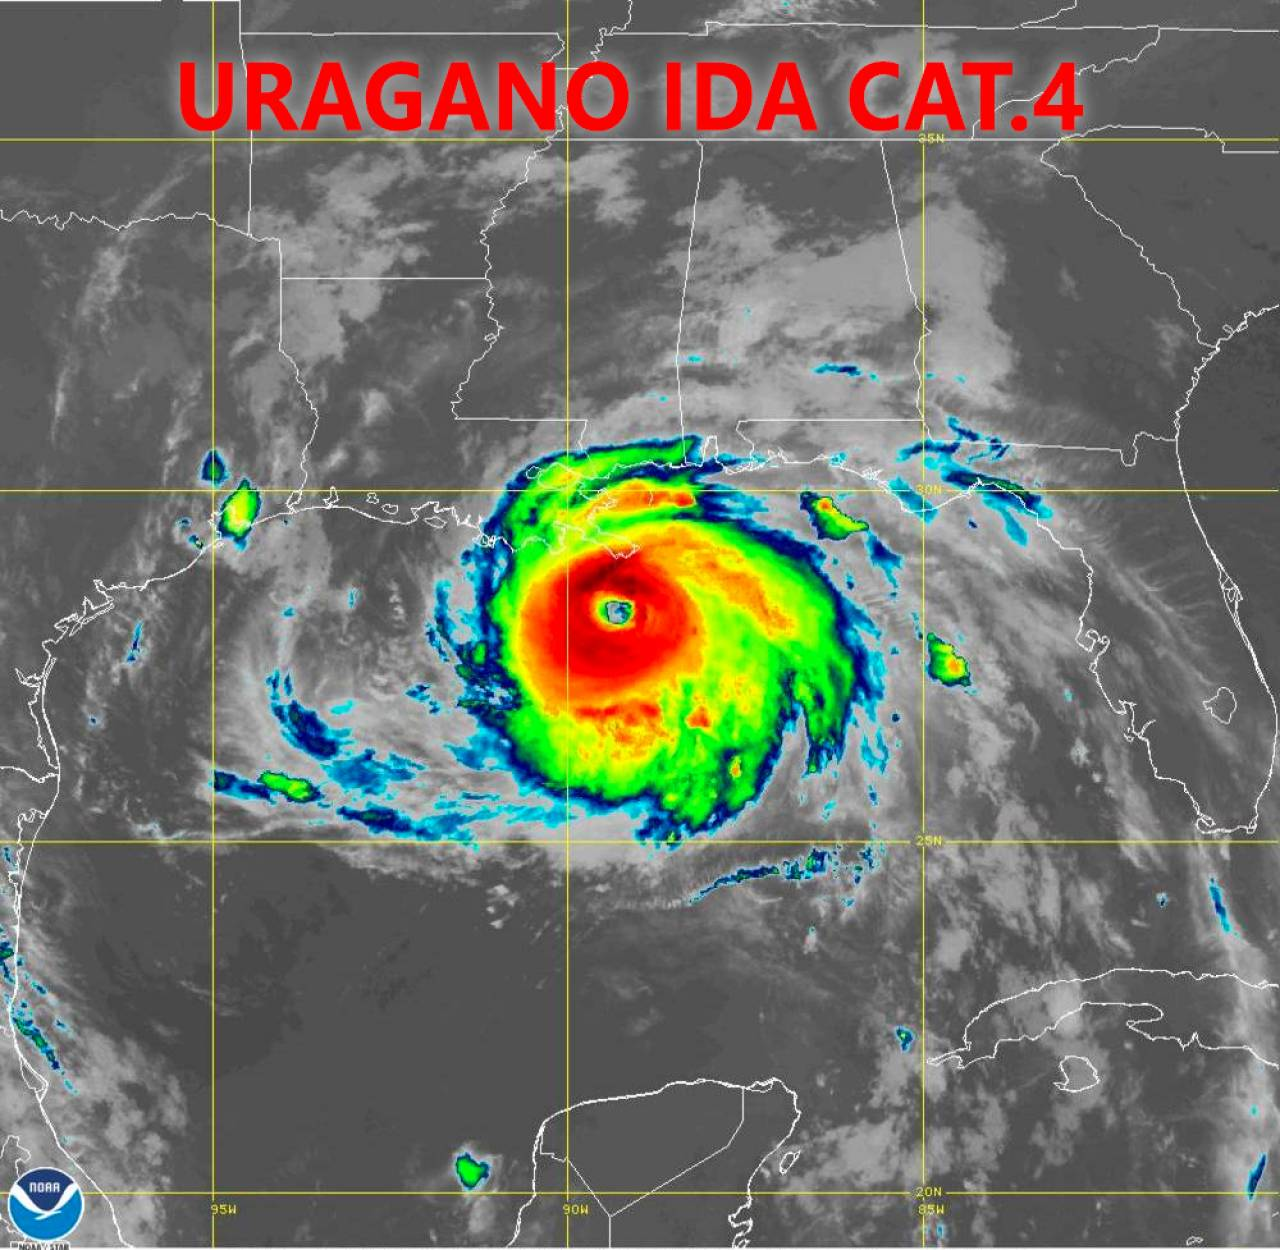 Uragano Ida visto dal Satellite